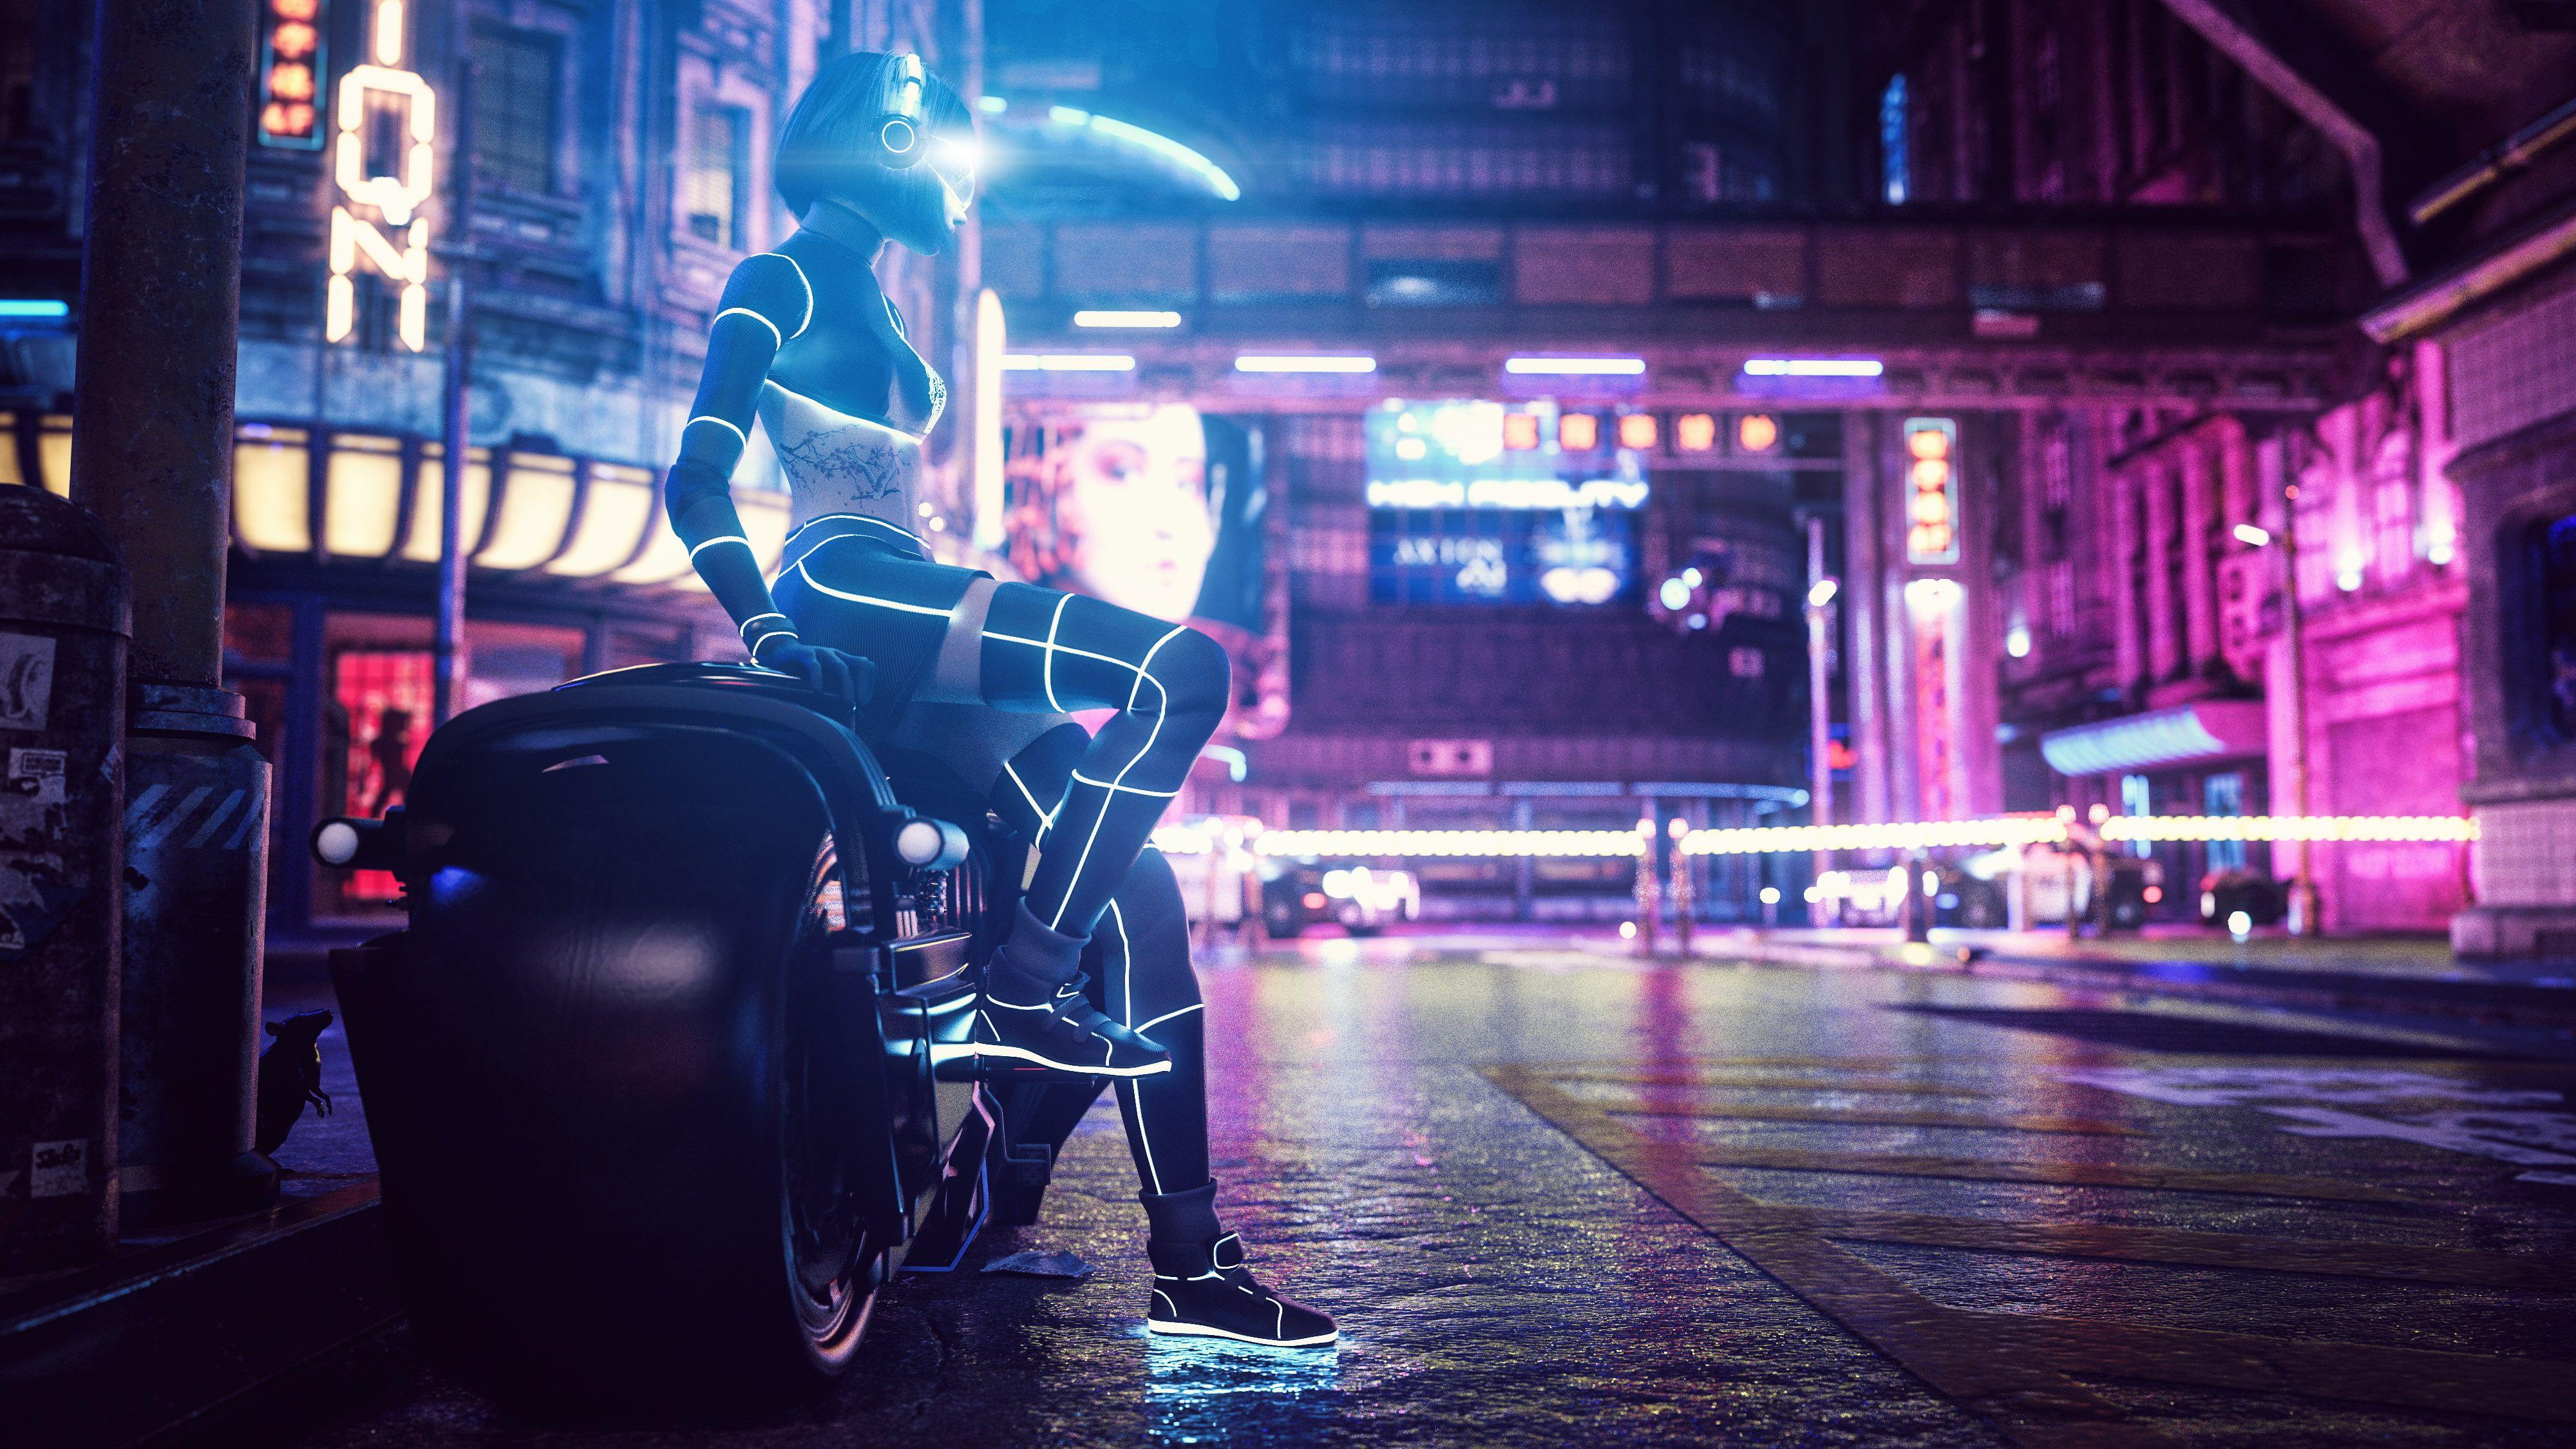 Digital Digital Art Artwork Illustration Futuristic Futuristic City Cyber Cyberpunk Lights City City Ligh In 2020 Futuristic City City Wallpaper Neon Wallpaper